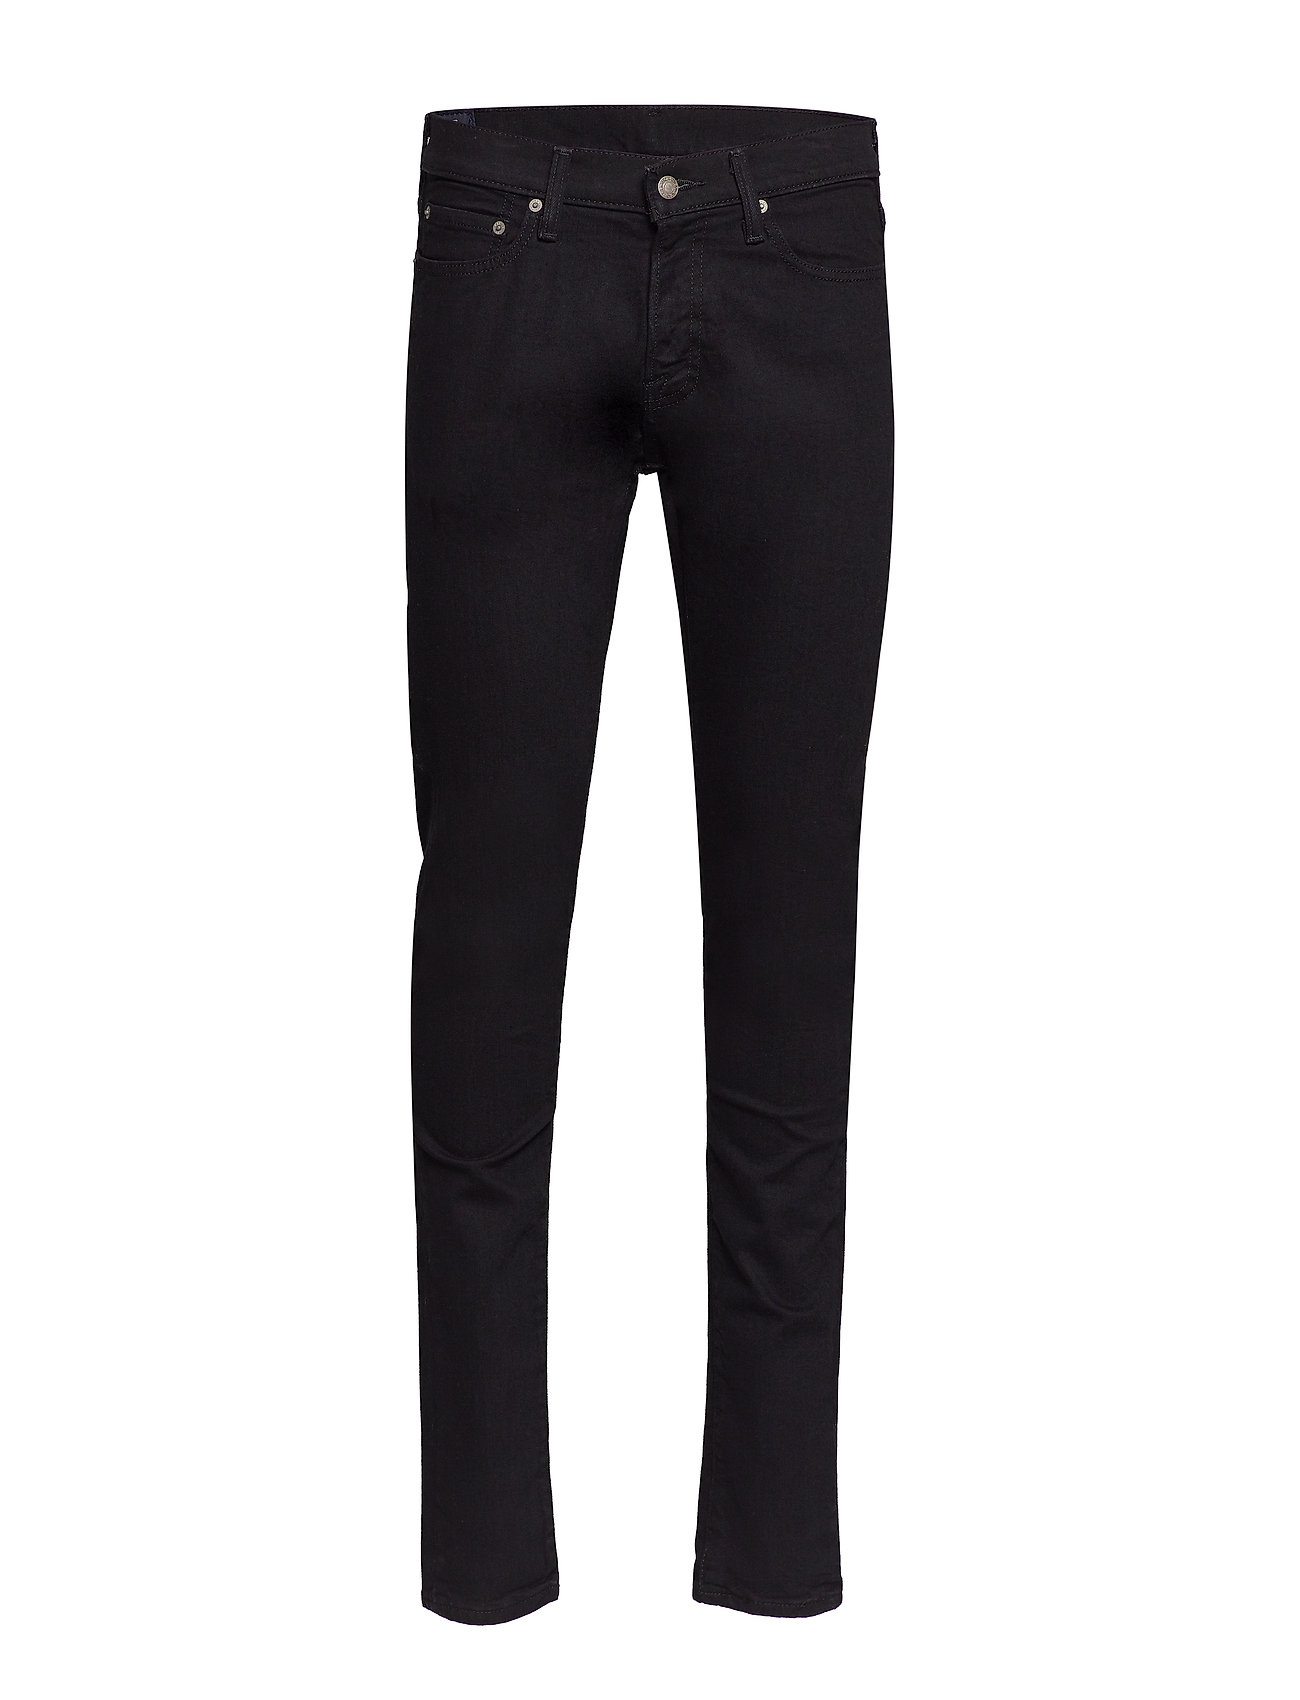 Abercrombie & Fitch Jeans - BLACK OD